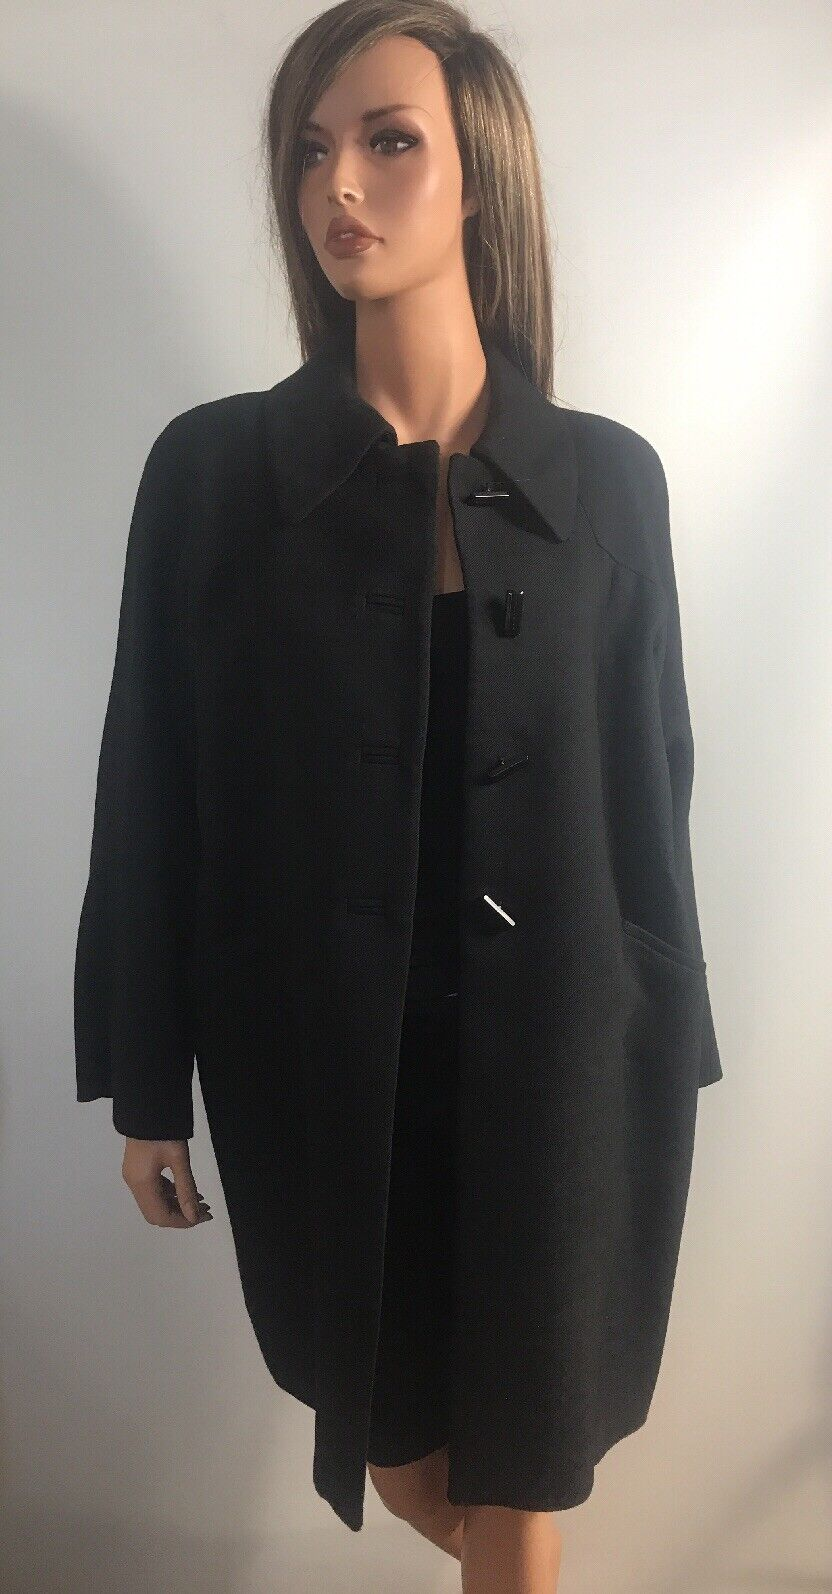 Zara kvinna 100% Wool Coat, Storlek L